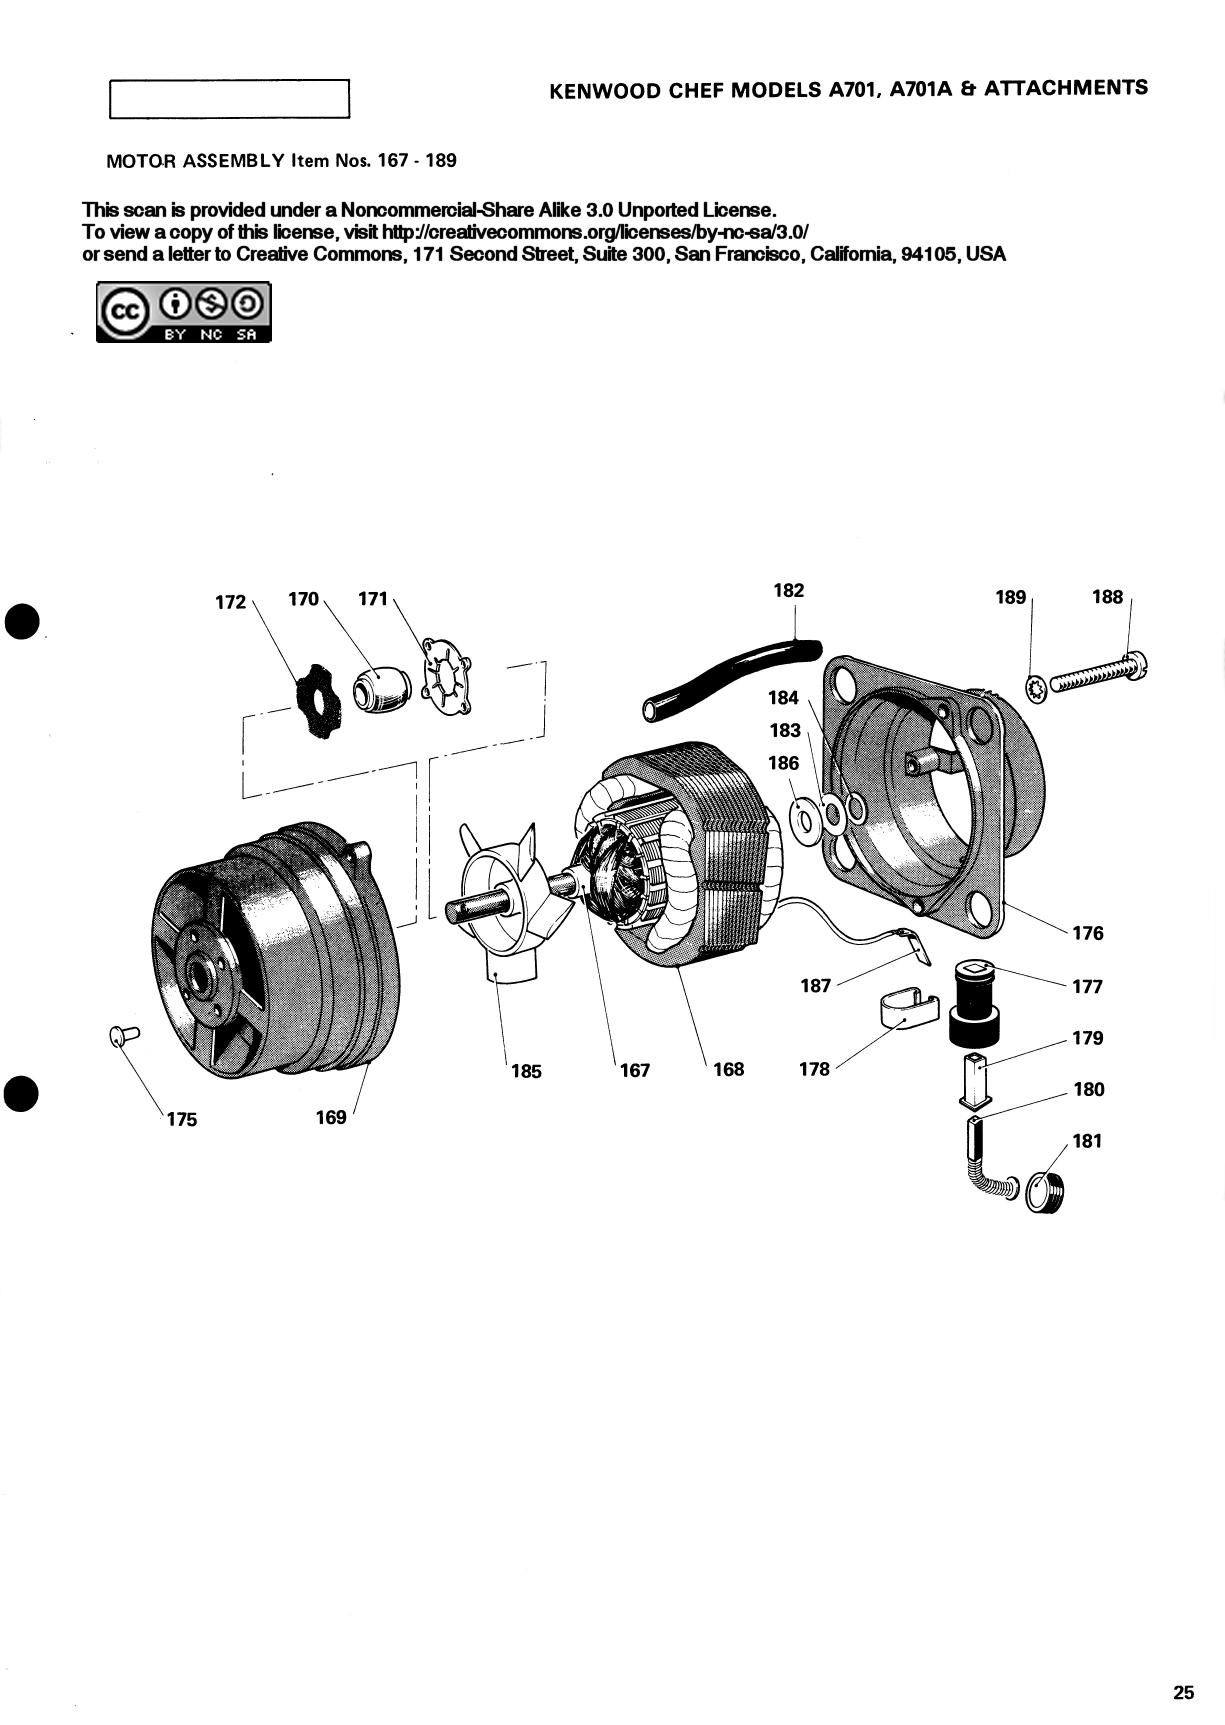 How To Repair A Kenwood Chef Motor Type 181 Wiring Diagram Of